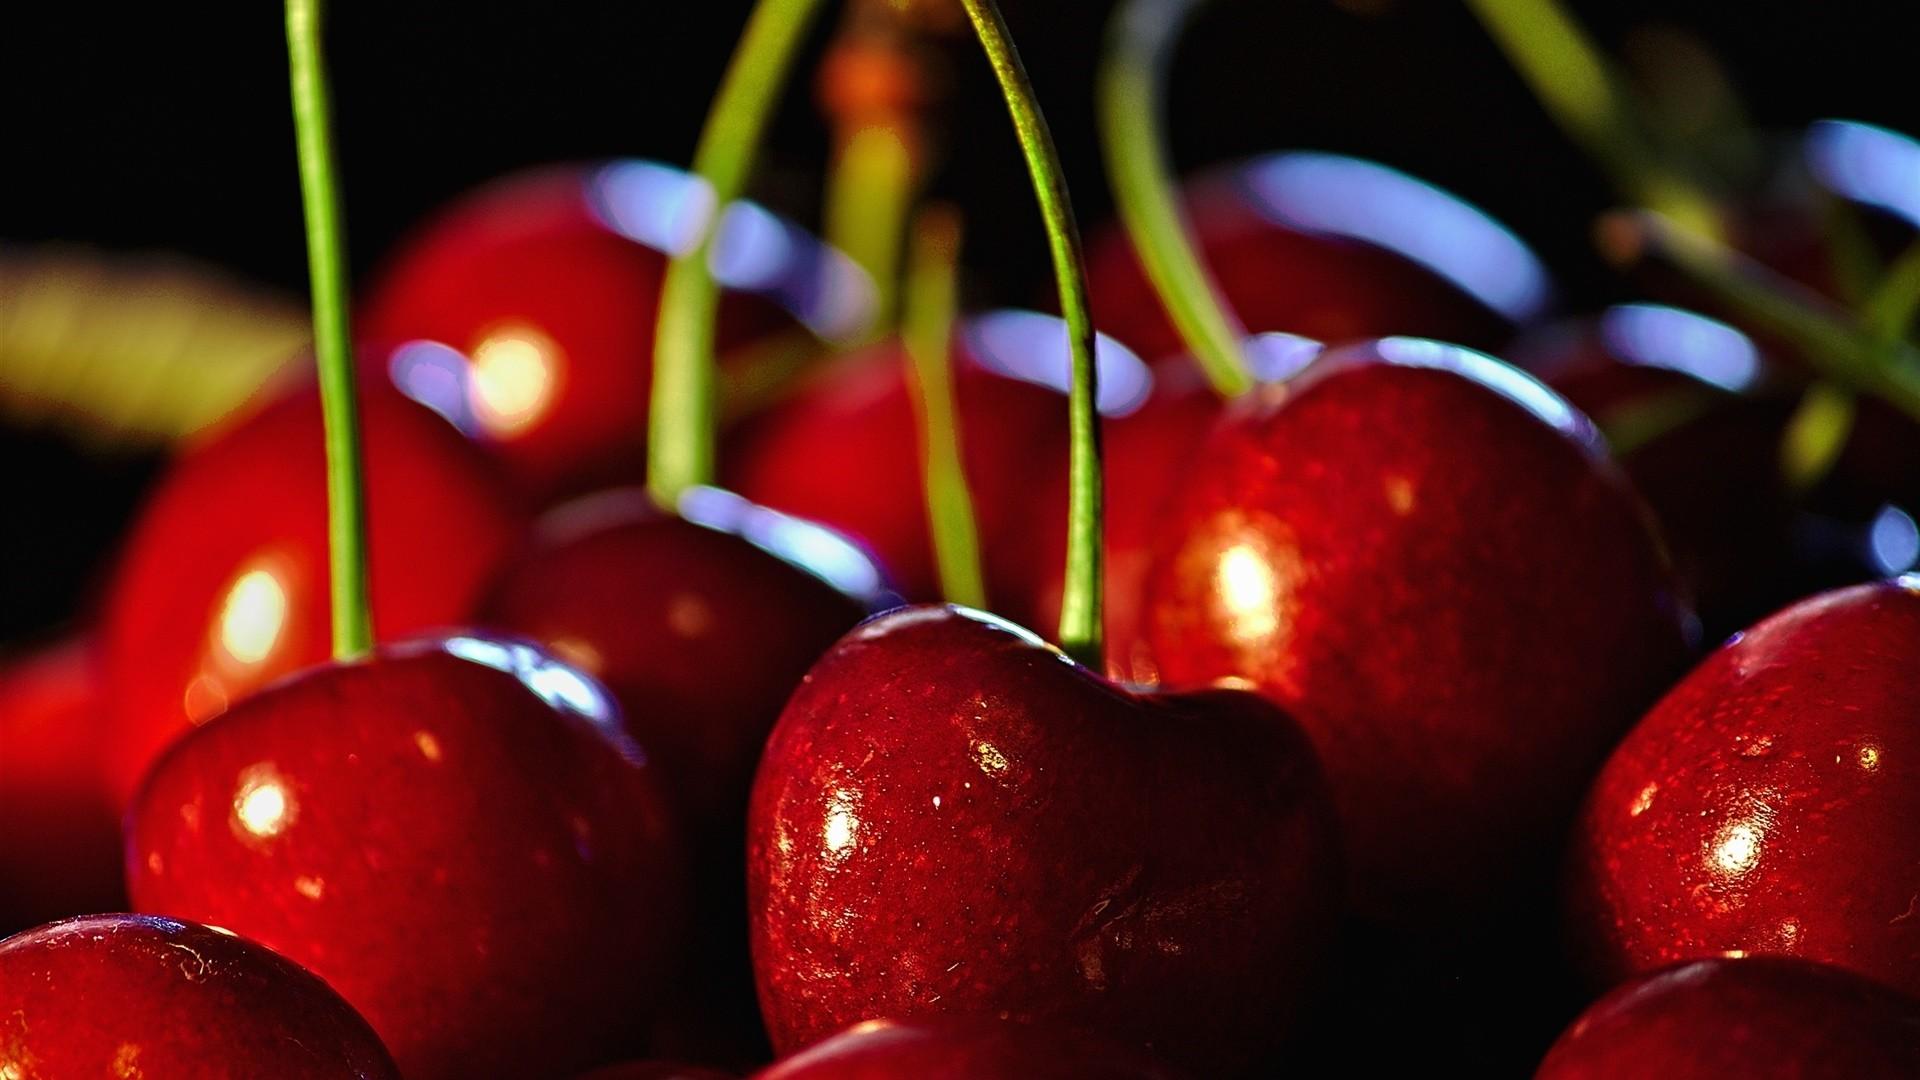 Cherry HD Wallpaper